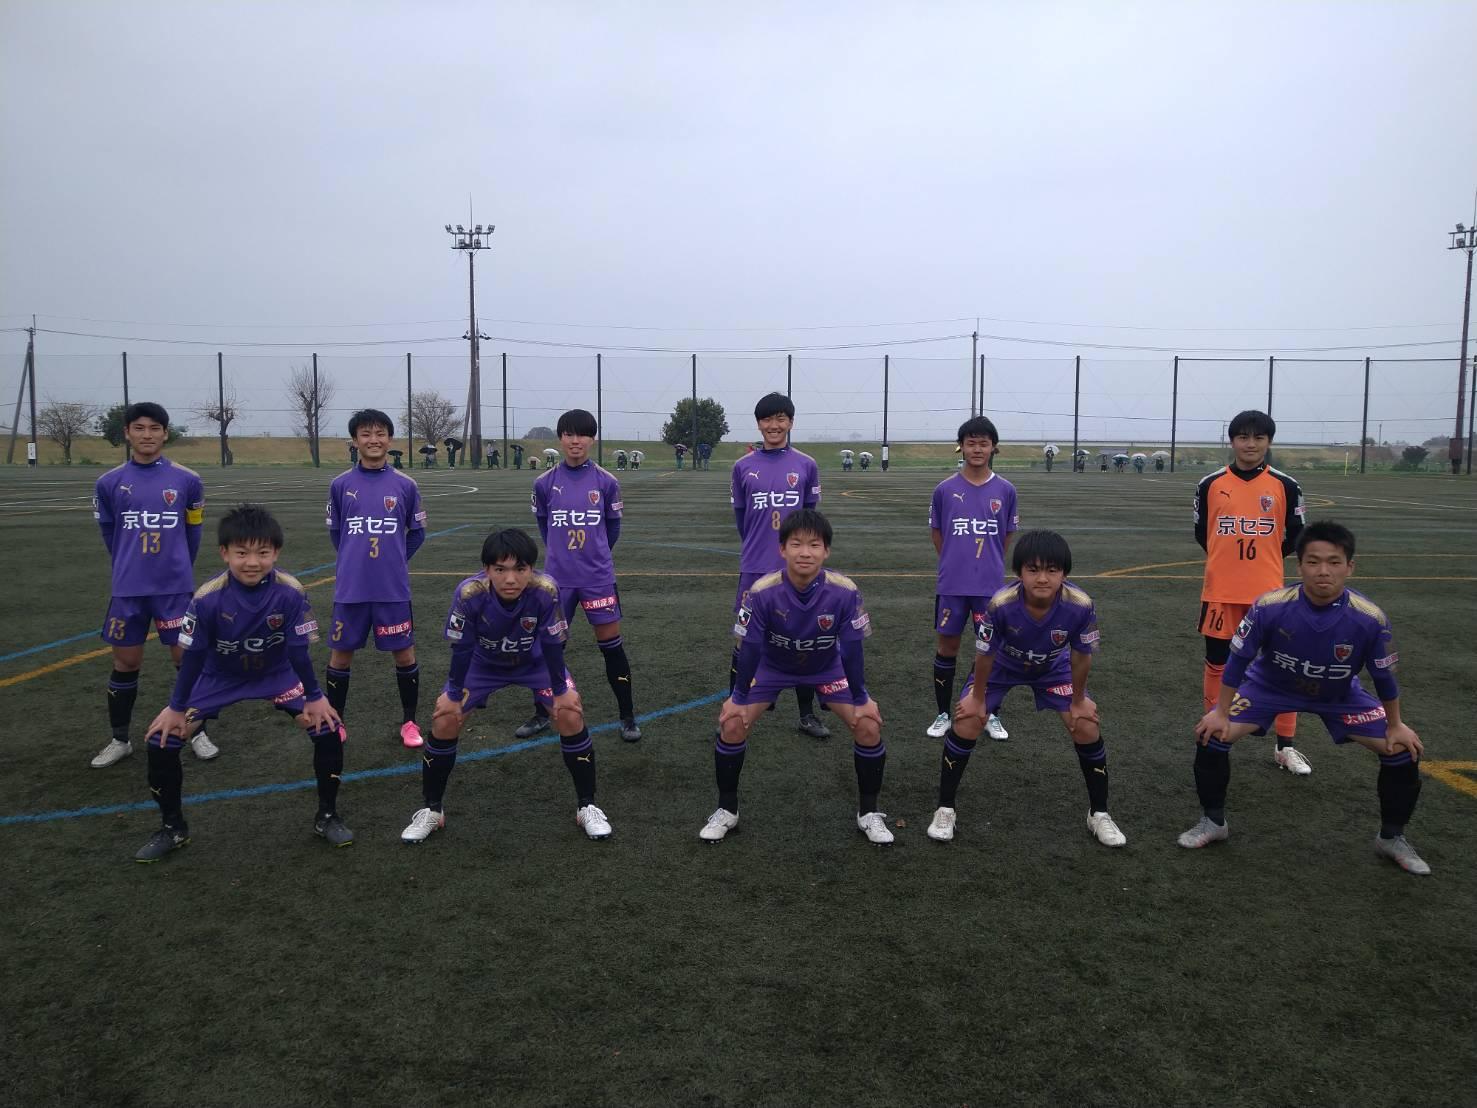 【U-15】高円宮杯JFA U-15サッカーリーグ滋賀2021 TOPリーグ第10節